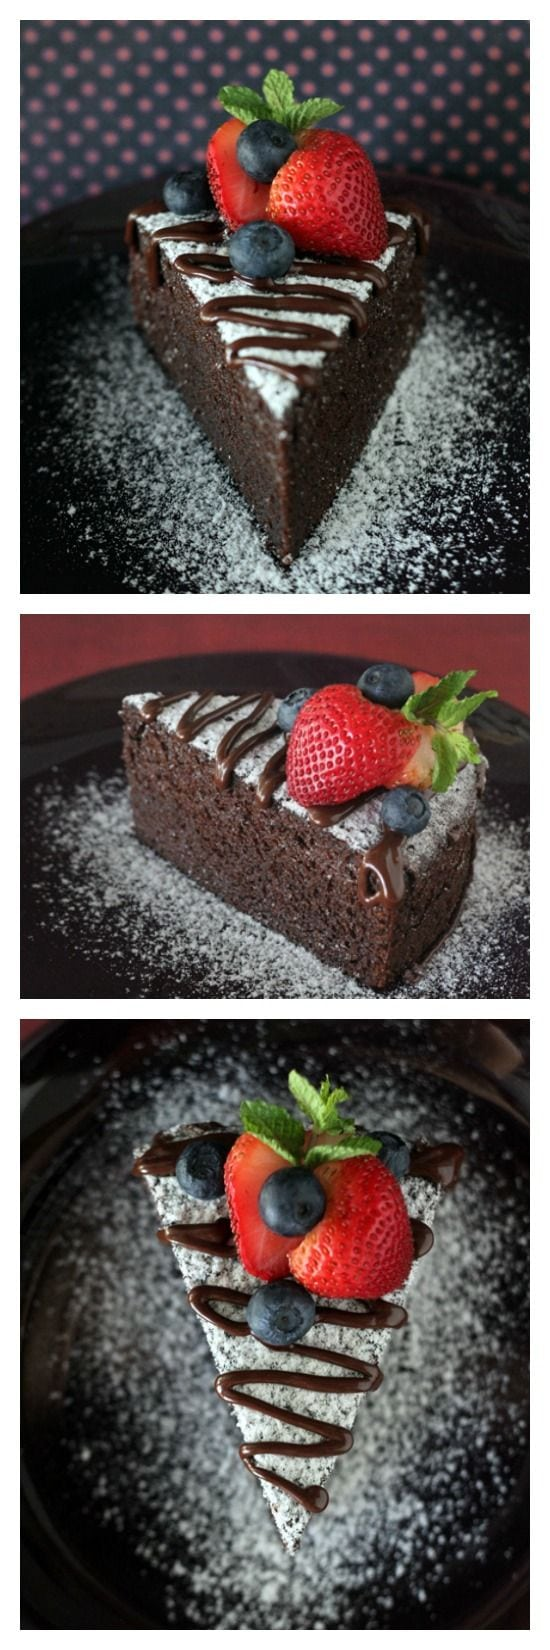 NO-BAKE Chocolate Cake – Moist, soft, and THE MOST decadent chocolate cake recipe EVER, perfect for V Day!!! | rasamalaysia.com